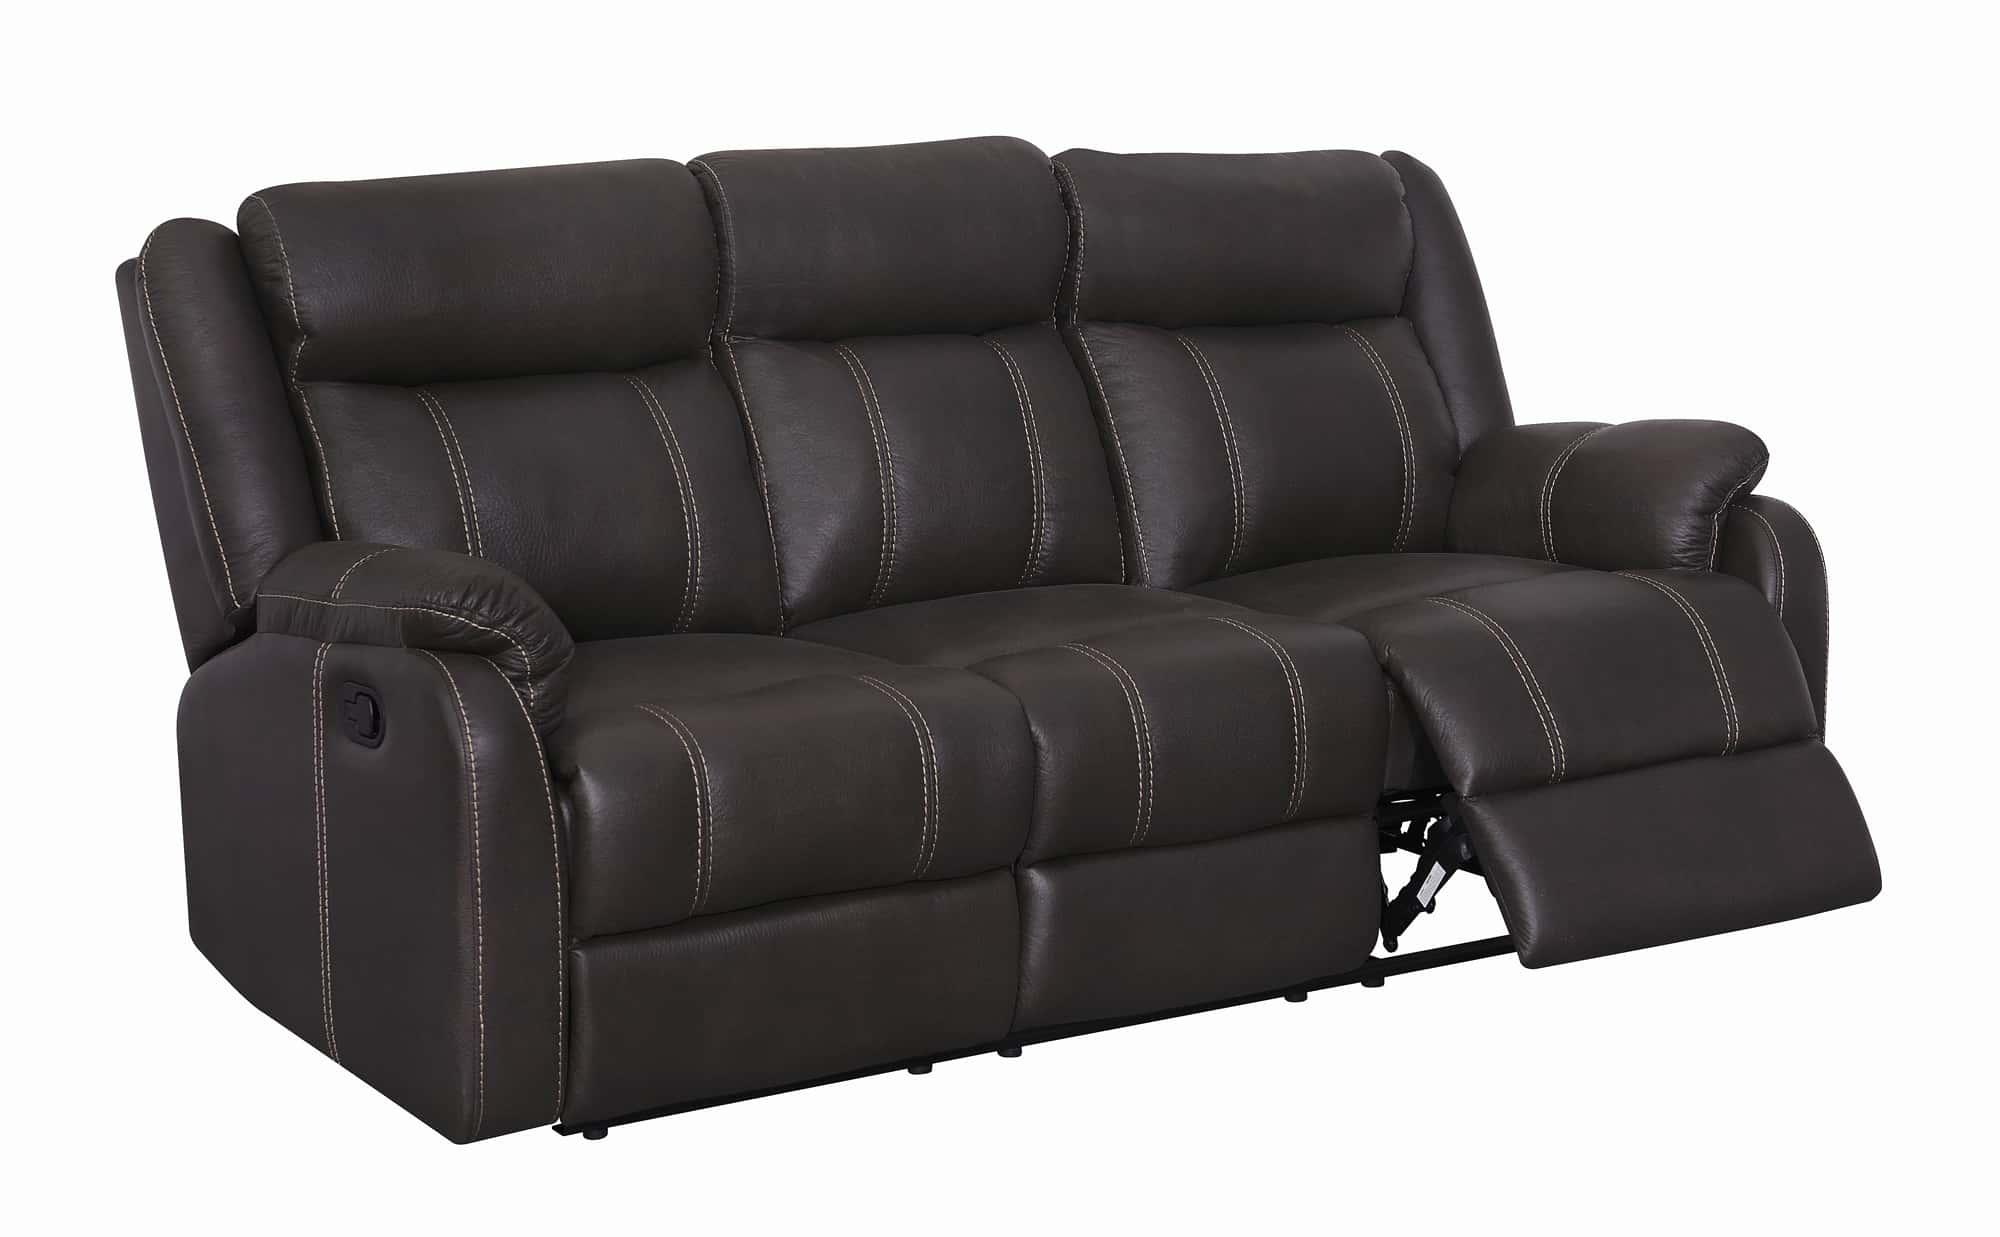 u7303c charcoal printed fabric reclining sofa w ddt dr by global furniture. Black Bedroom Furniture Sets. Home Design Ideas